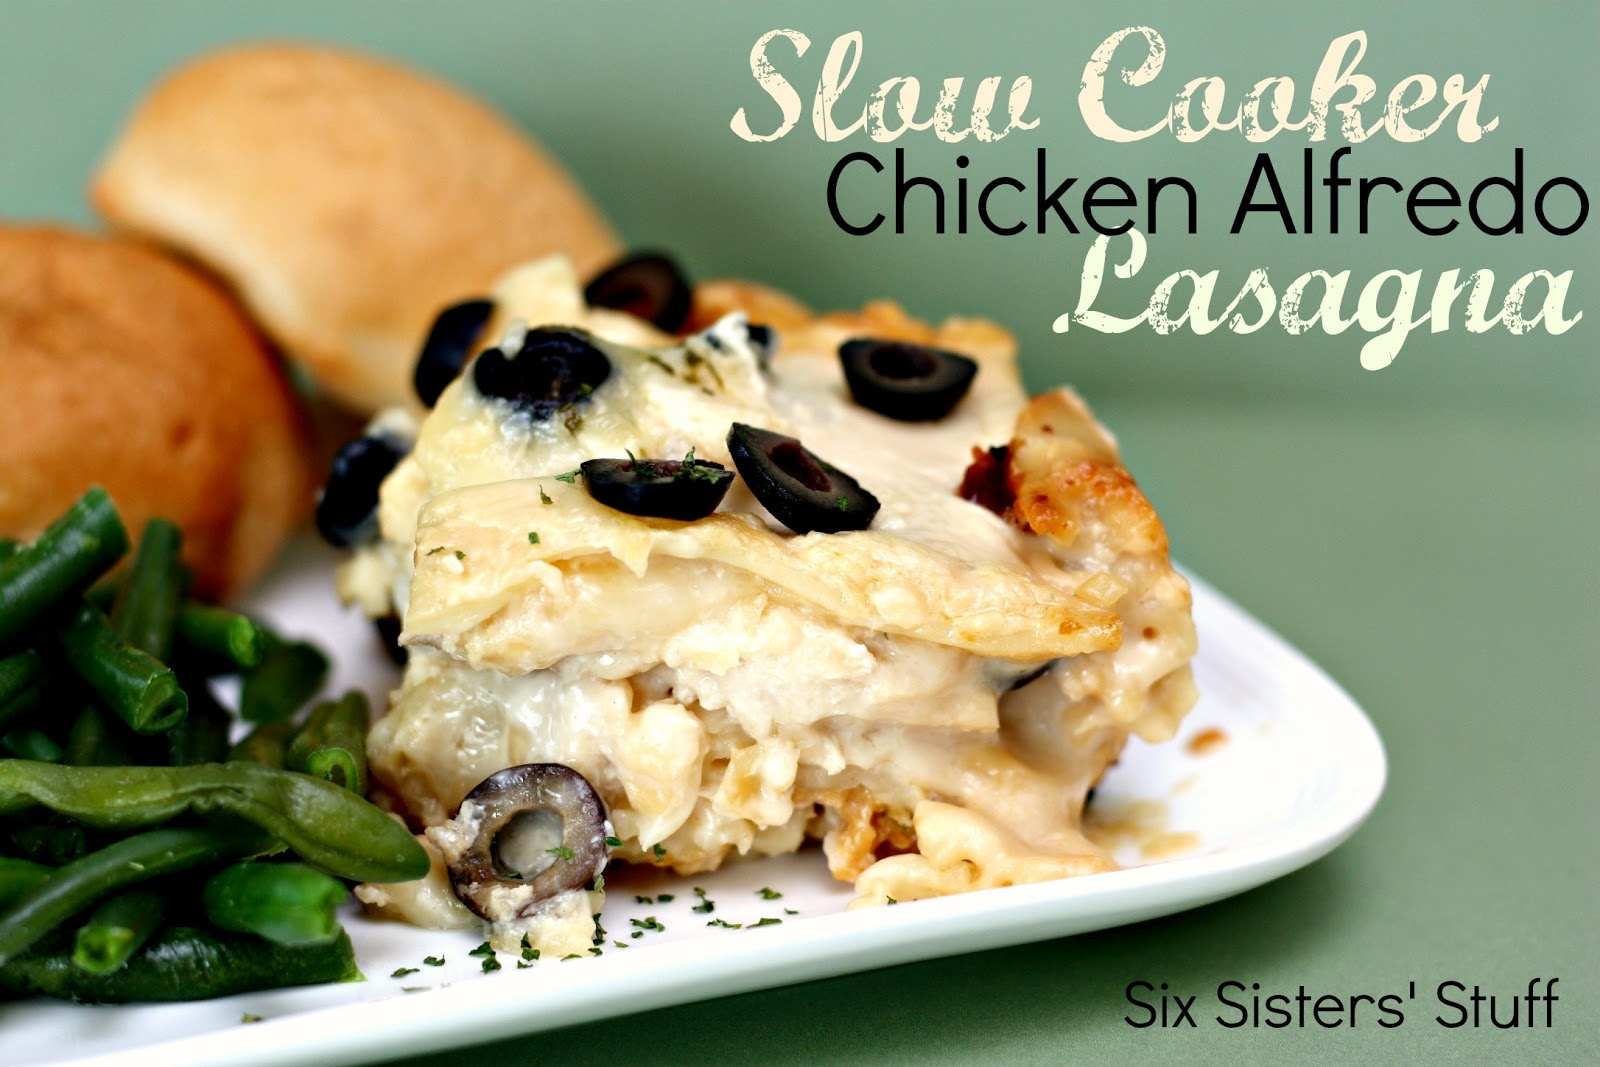 Slow Cooker Chicken Alfredo Lasagna | Six Sisters' Stuff